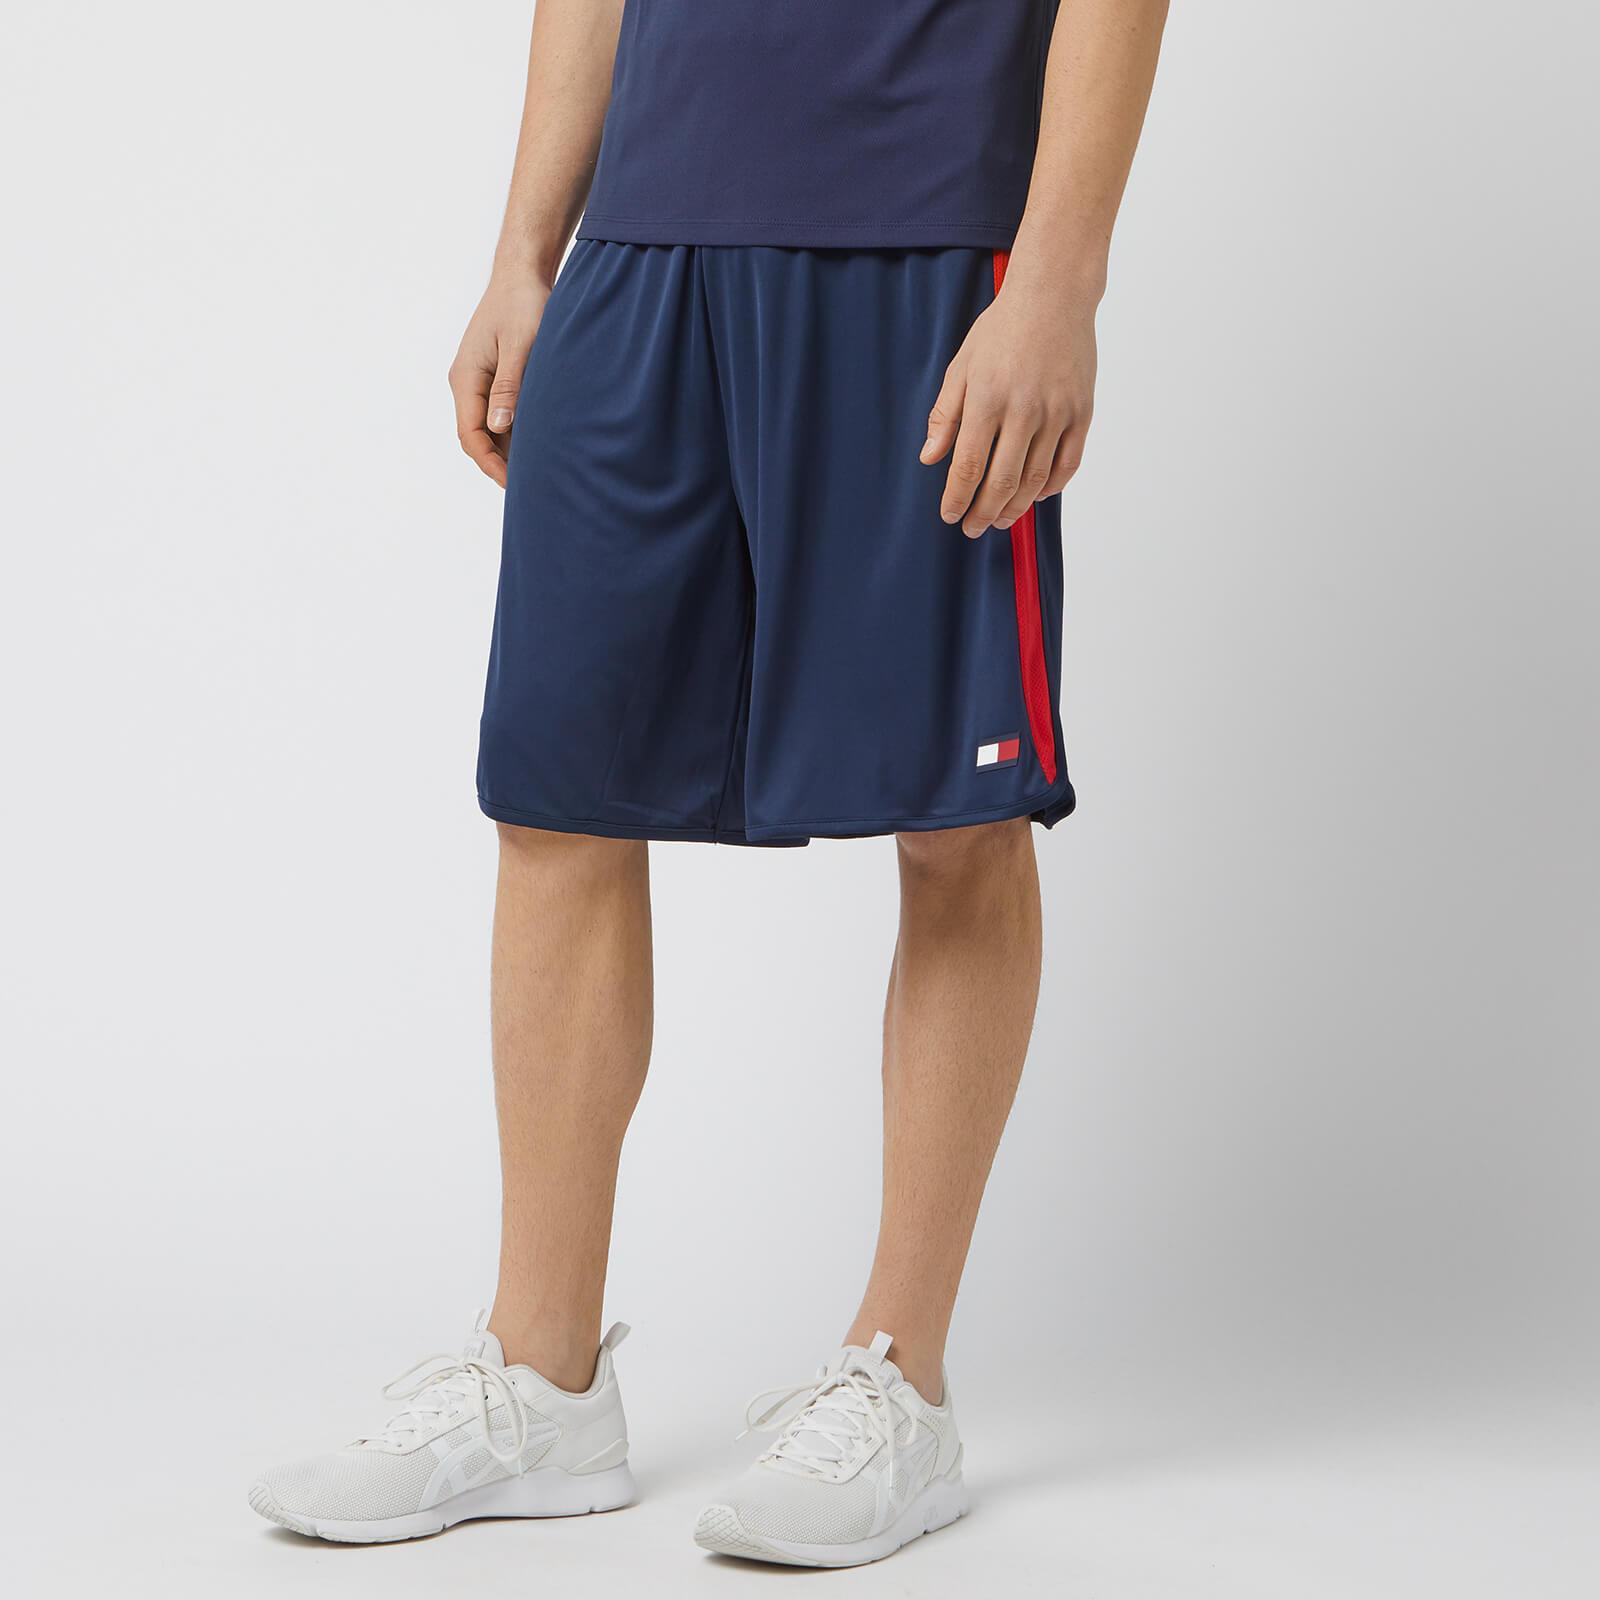 f6d8fa58 Tommy Hilfiger Sport Men's Shorts With Mesh - Sport Navy Mens Clothing    TheHut.com